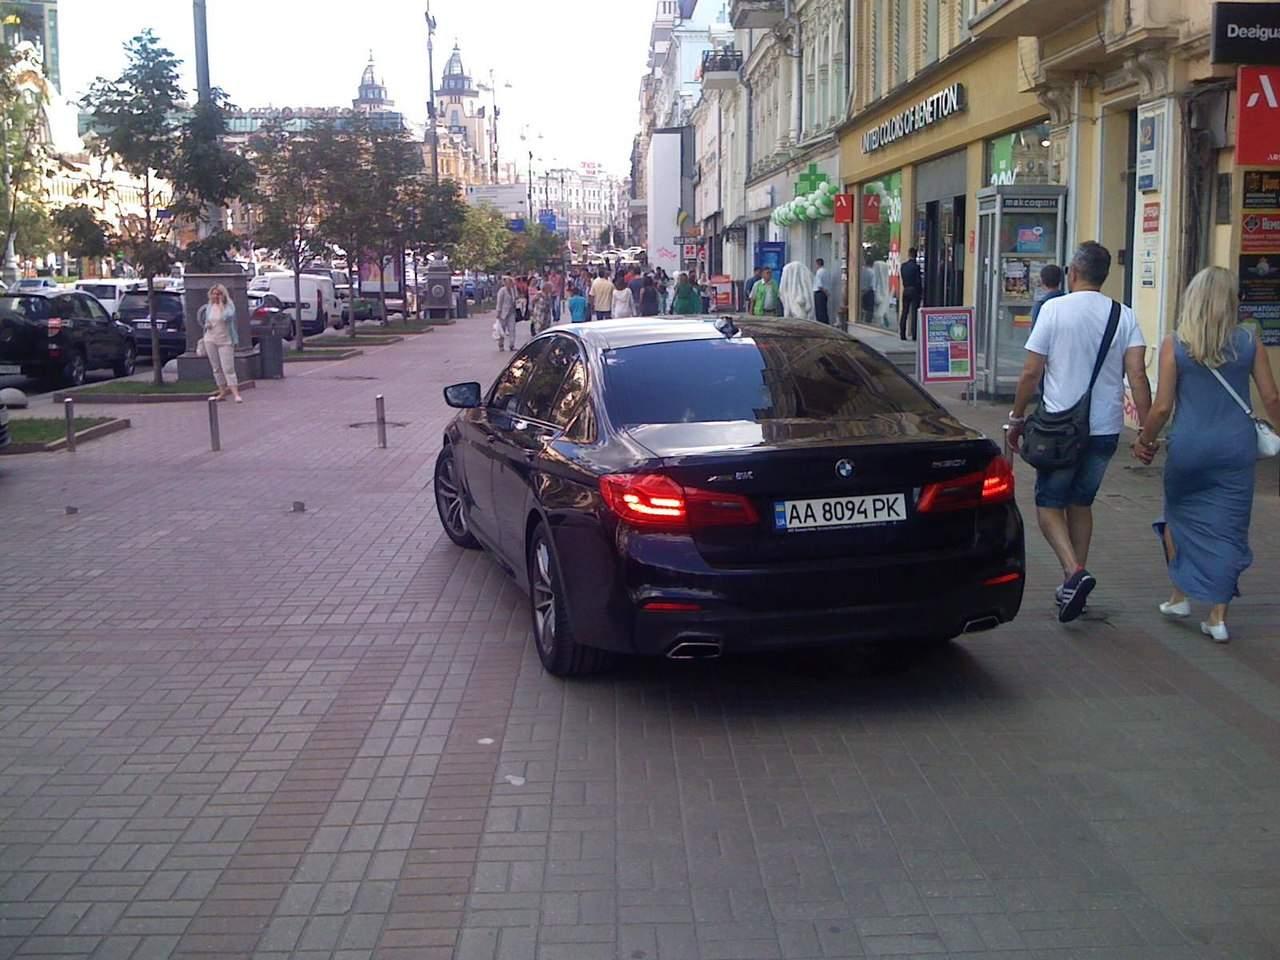 Безграничная свобода: в Киеве недалеко от мэрии на тротуаре срезали столбики (фото)